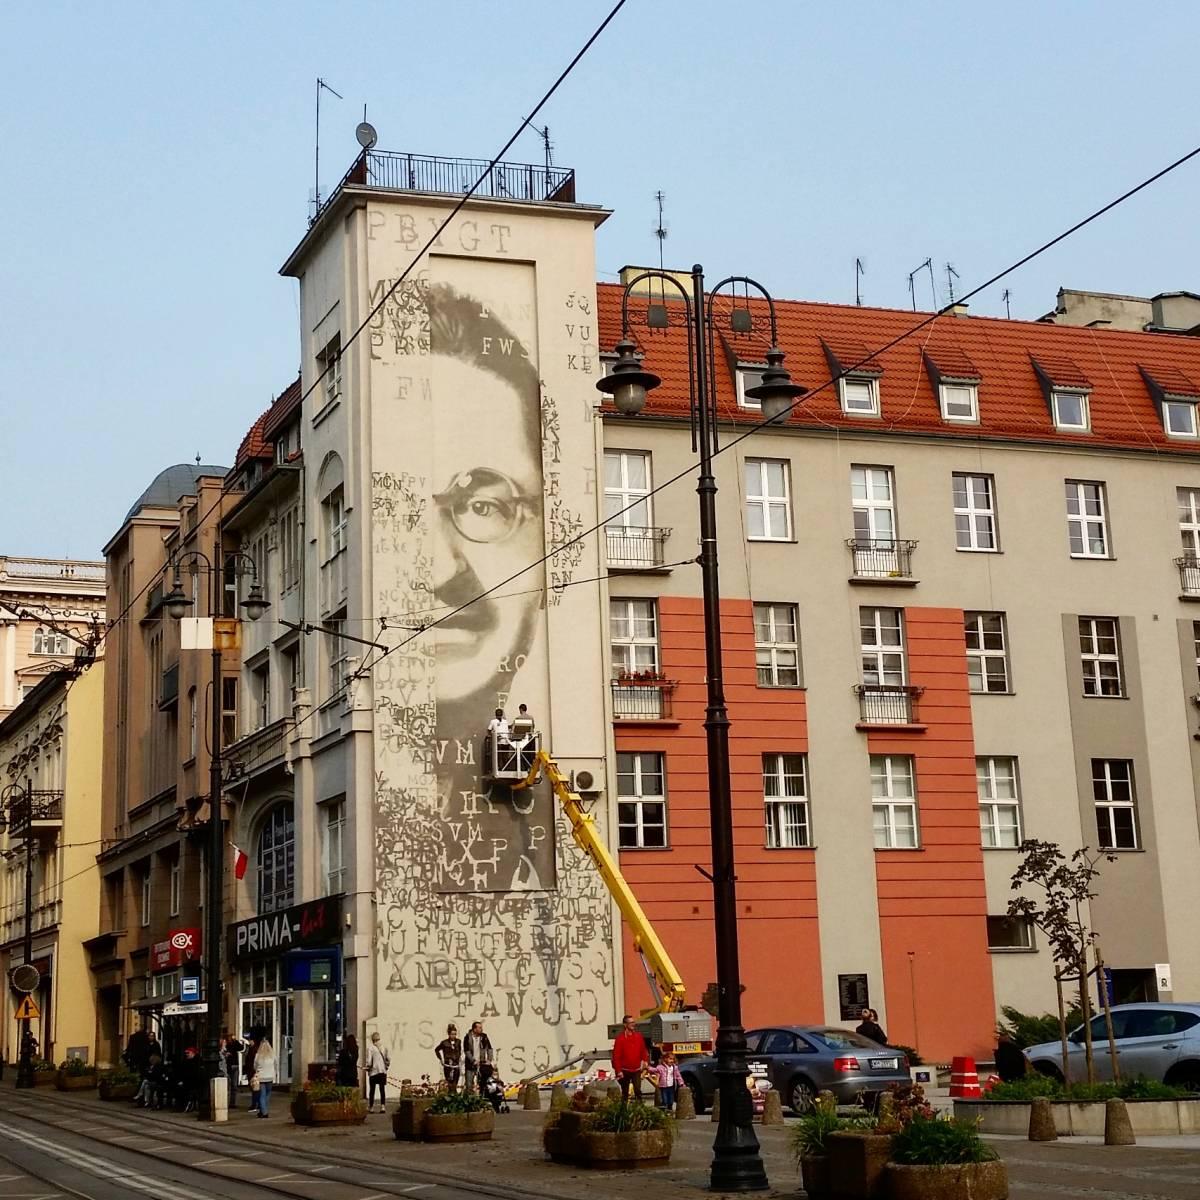 Marian Rejewski's mural